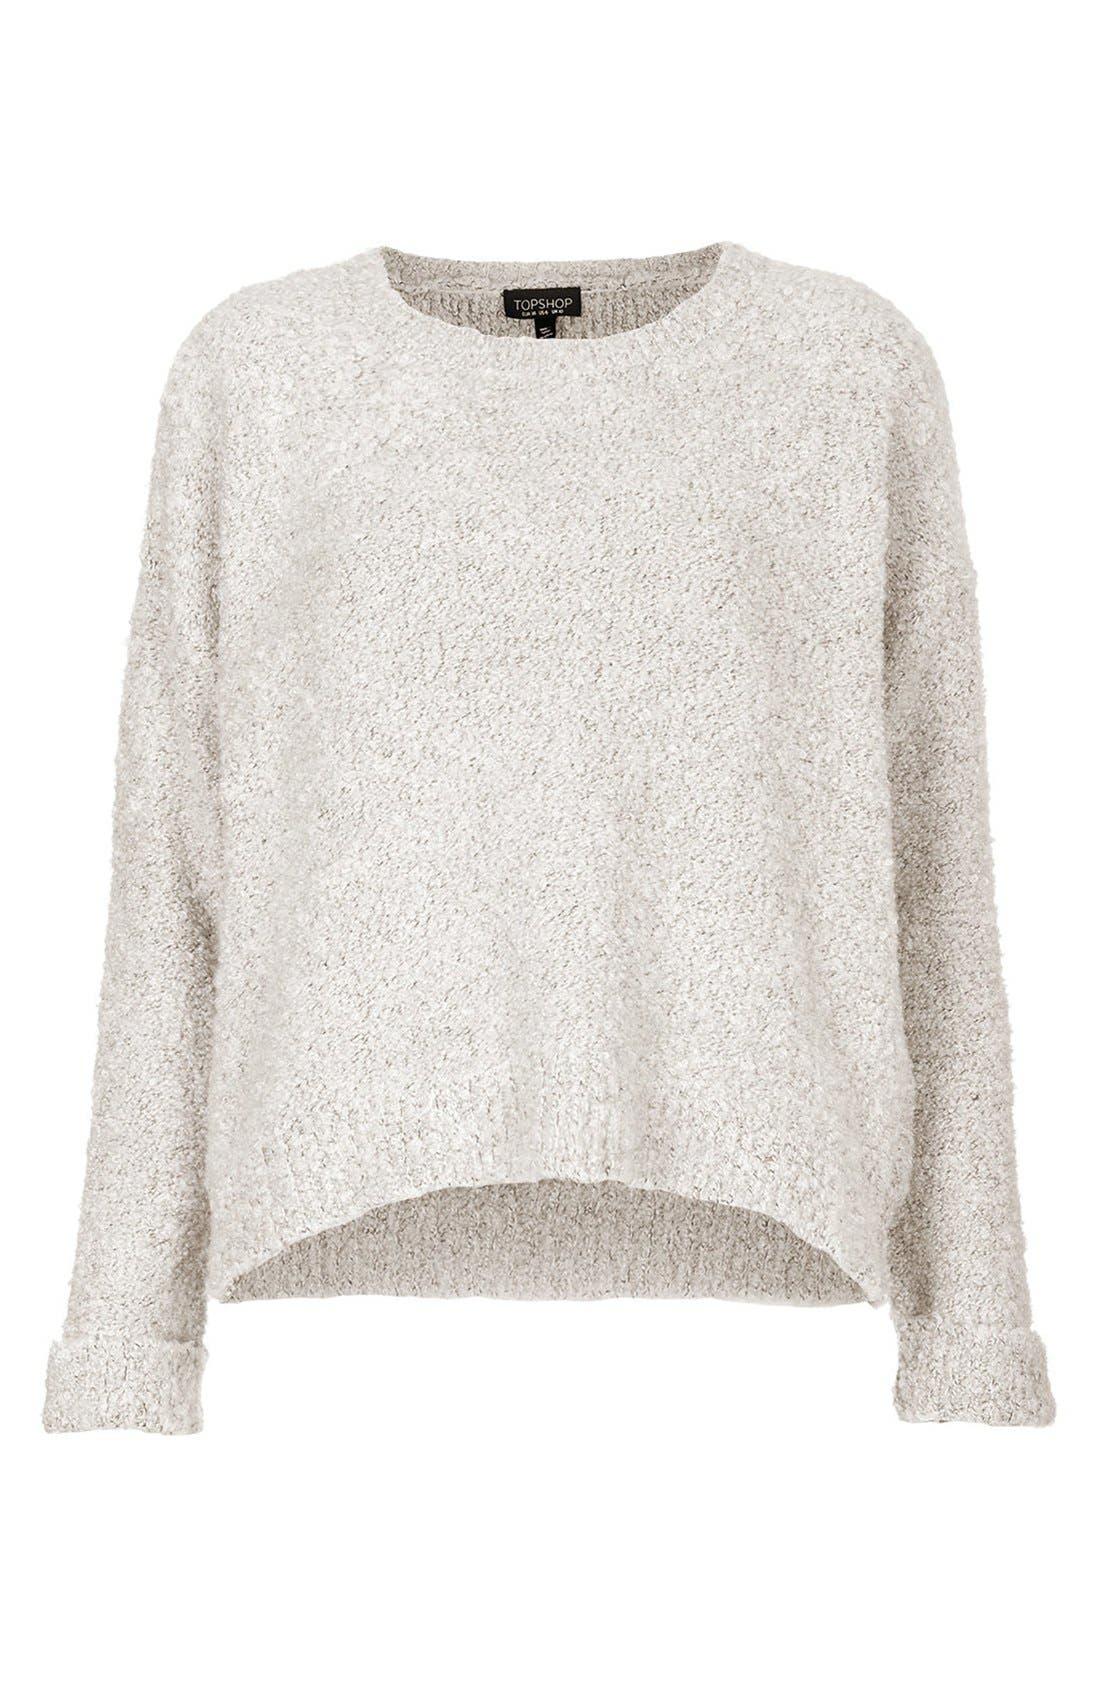 Alternate Image 3  - Topshop Bouclé Knit Sweater